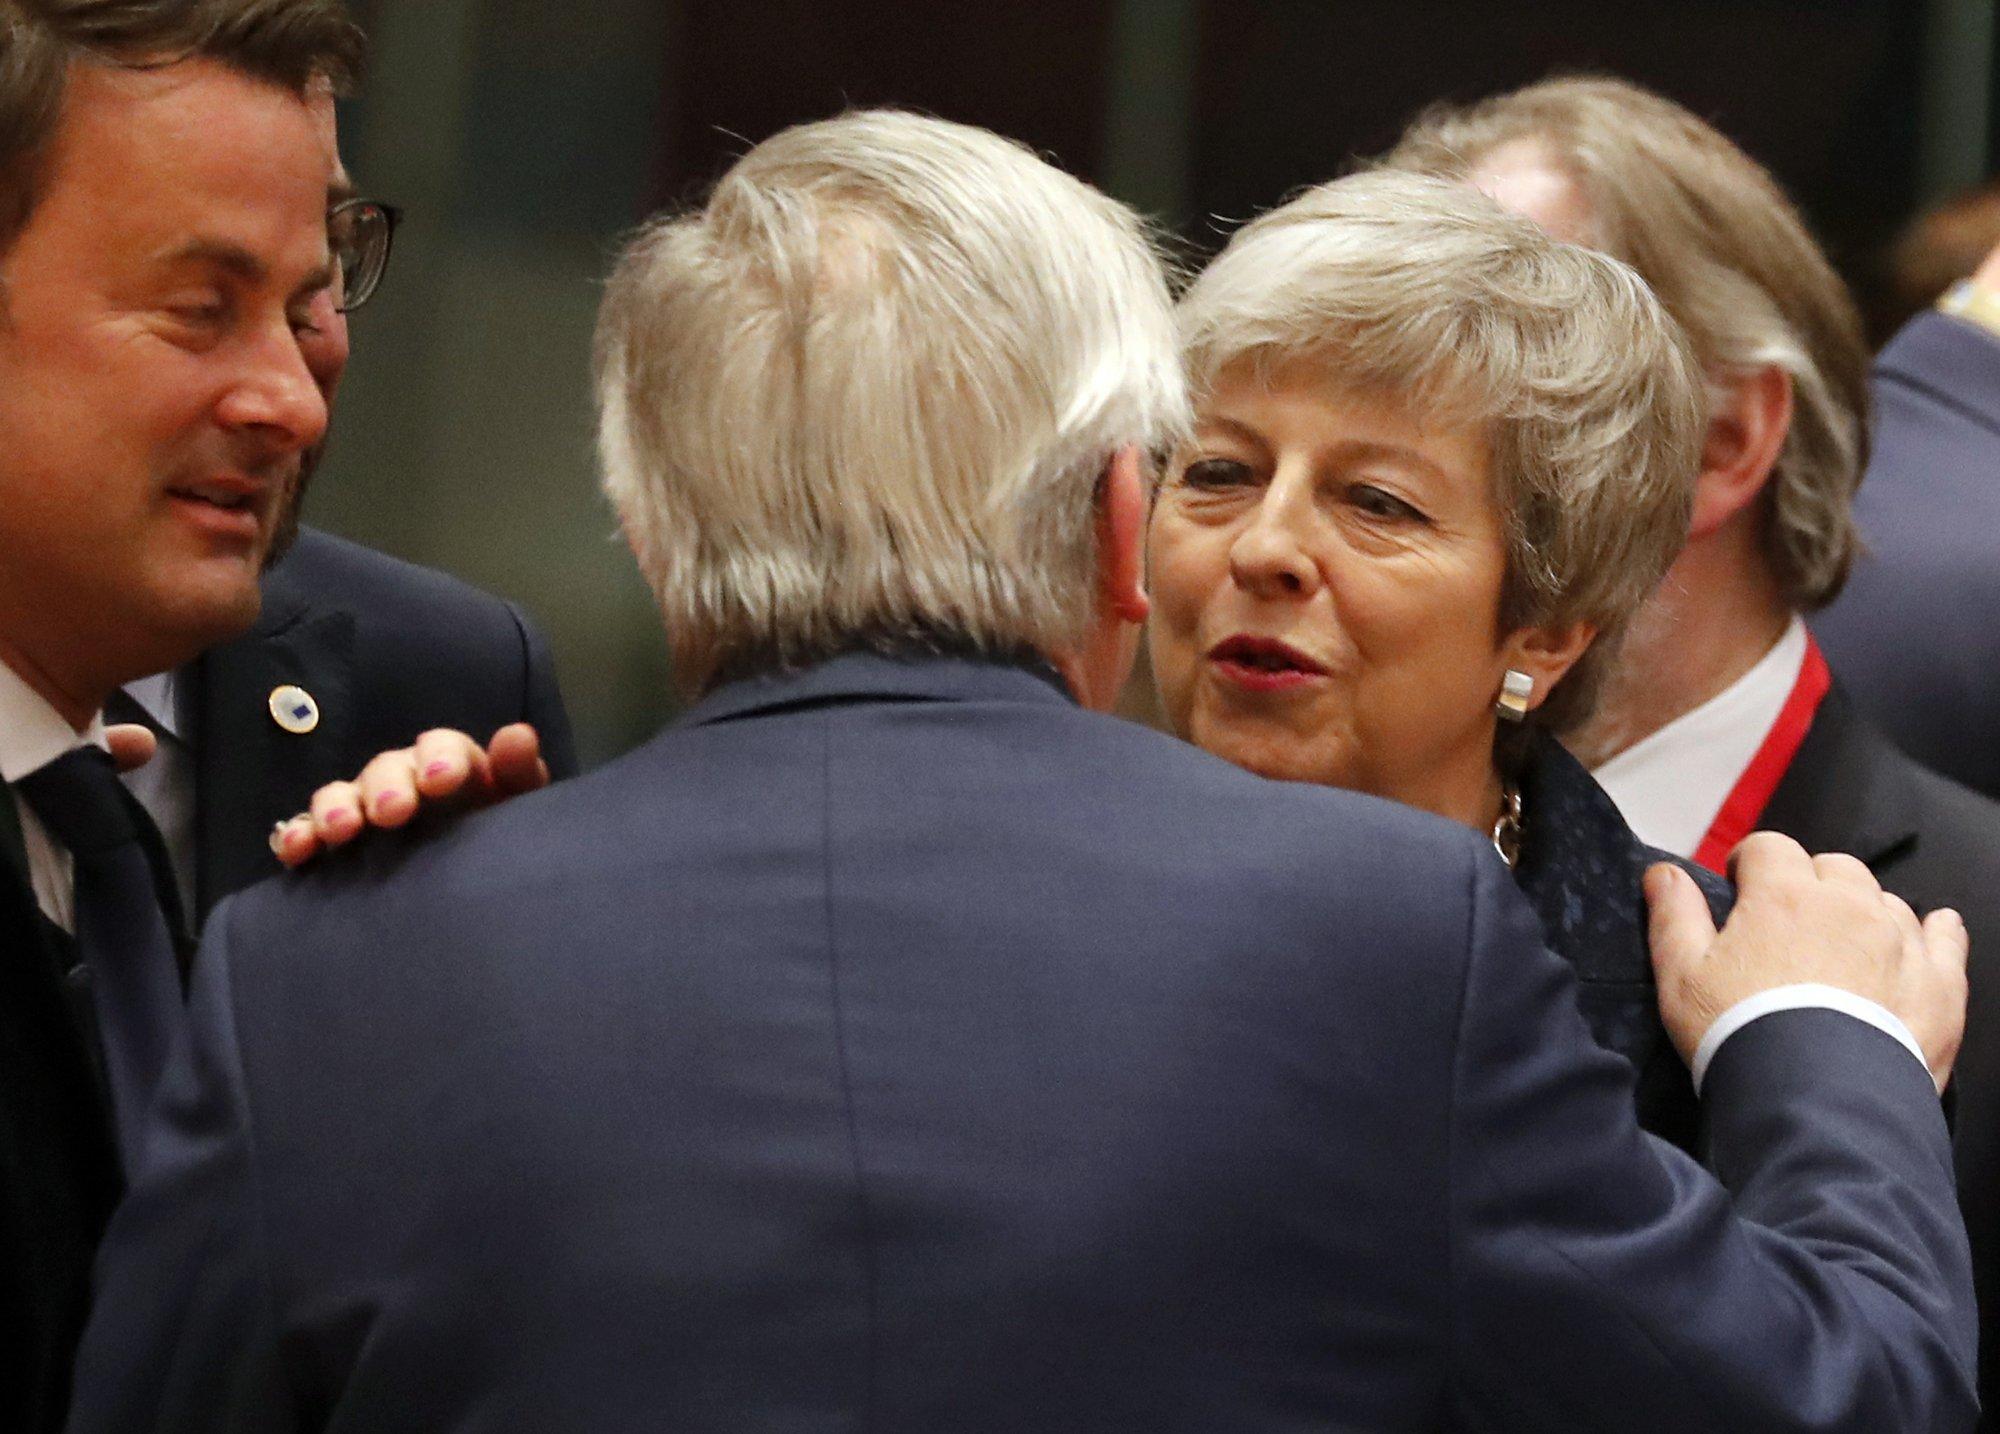 EU chief says bloc decides on Brexit response